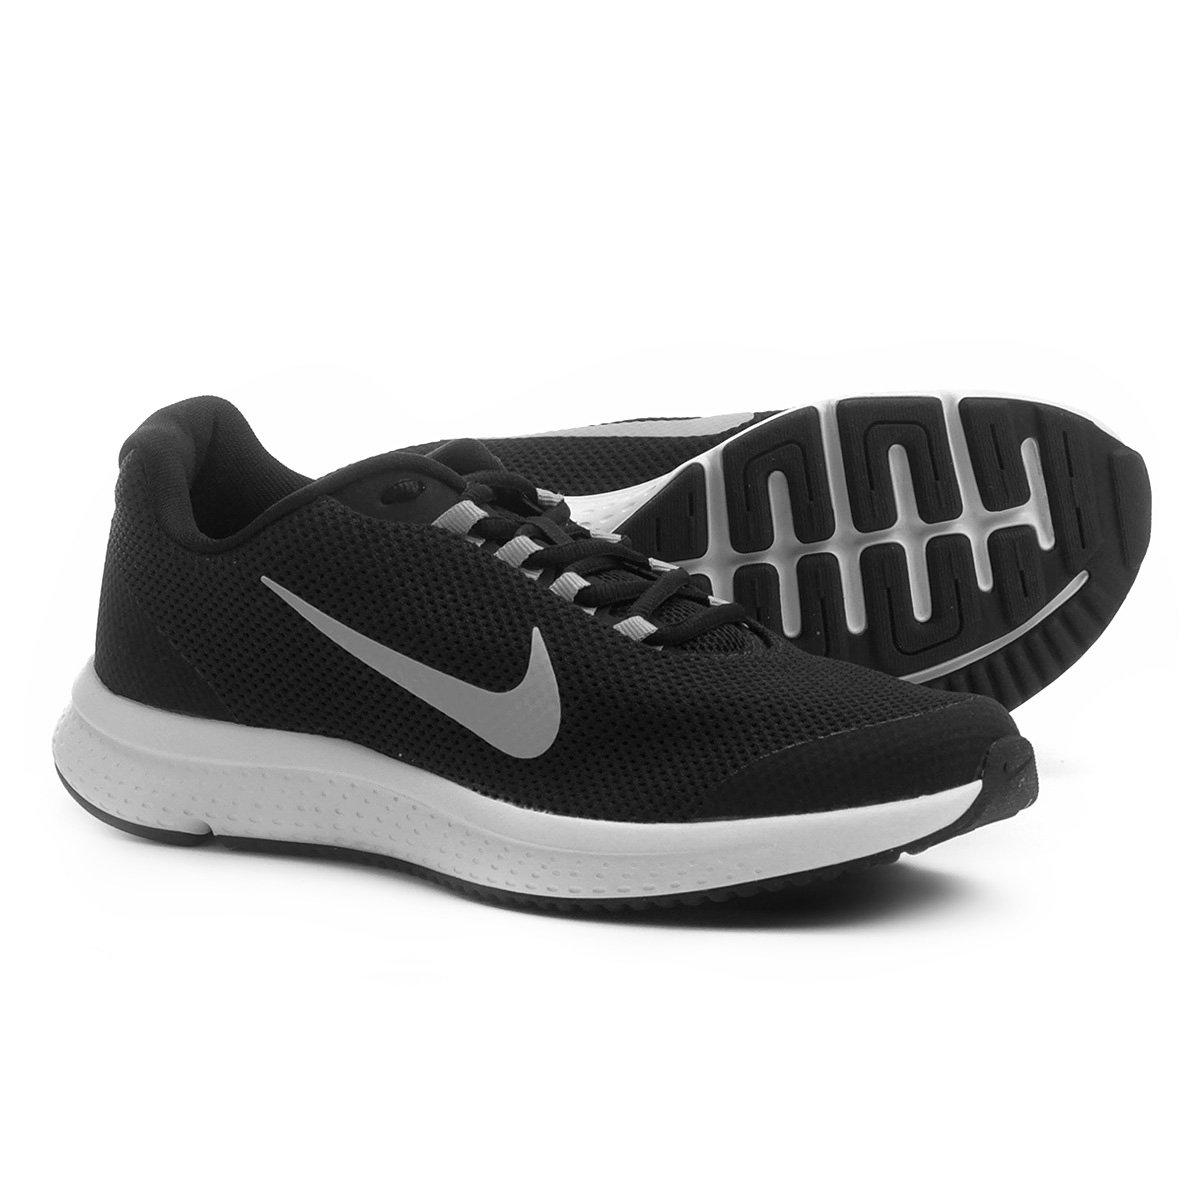 5450ec5f135 Tênis Nike Runallday Masculino - Preto e Branco - Compre Agora ...